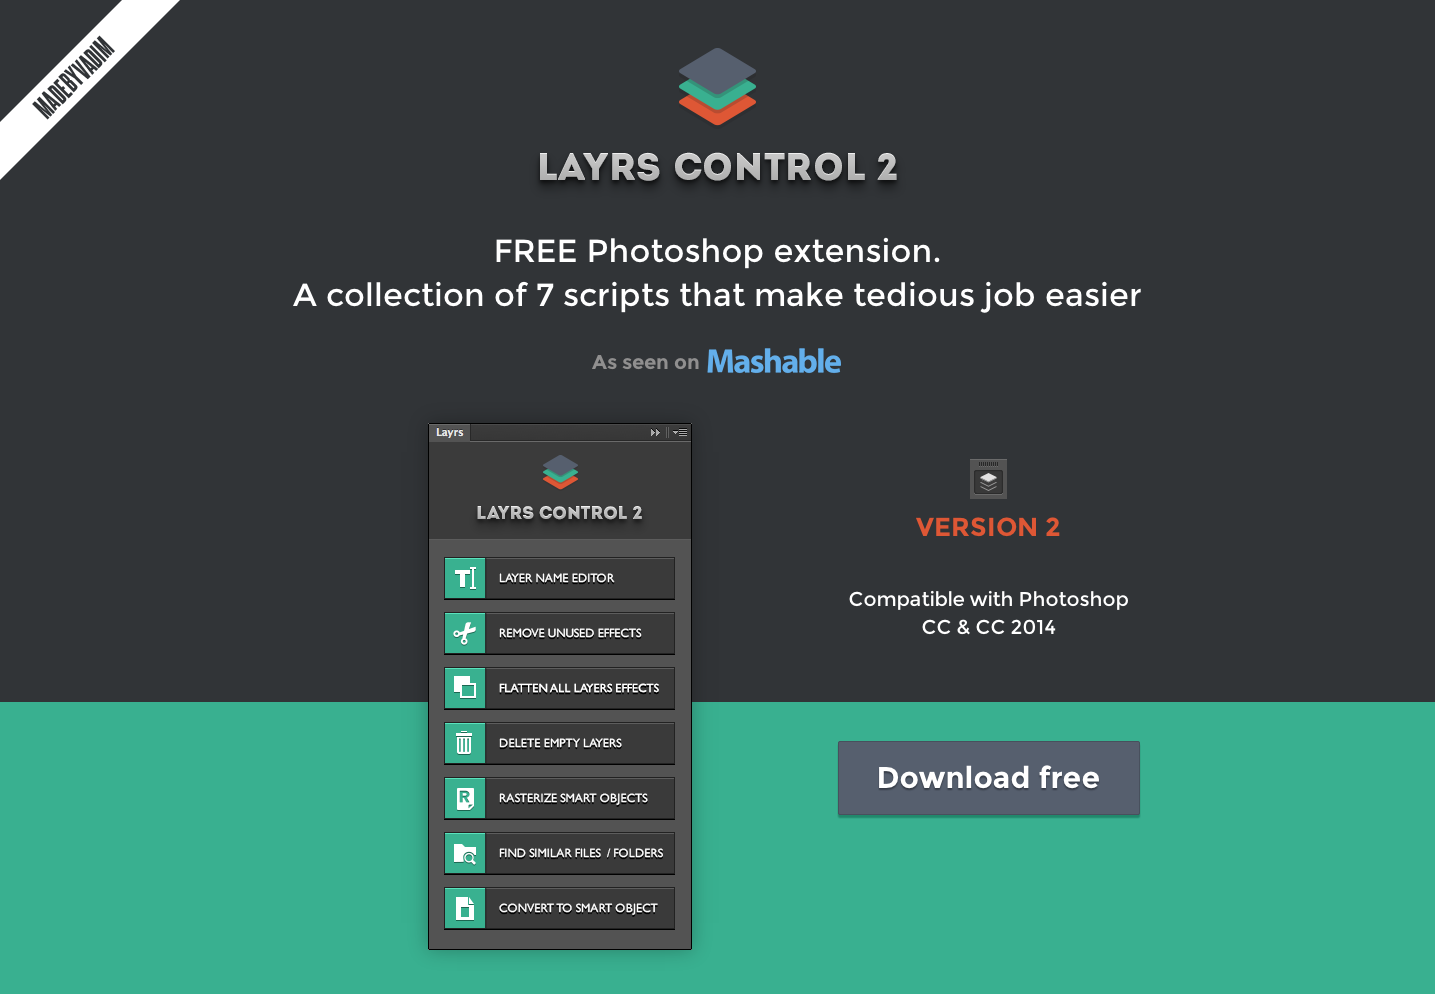 layrs-control-2 | web-crunch.com